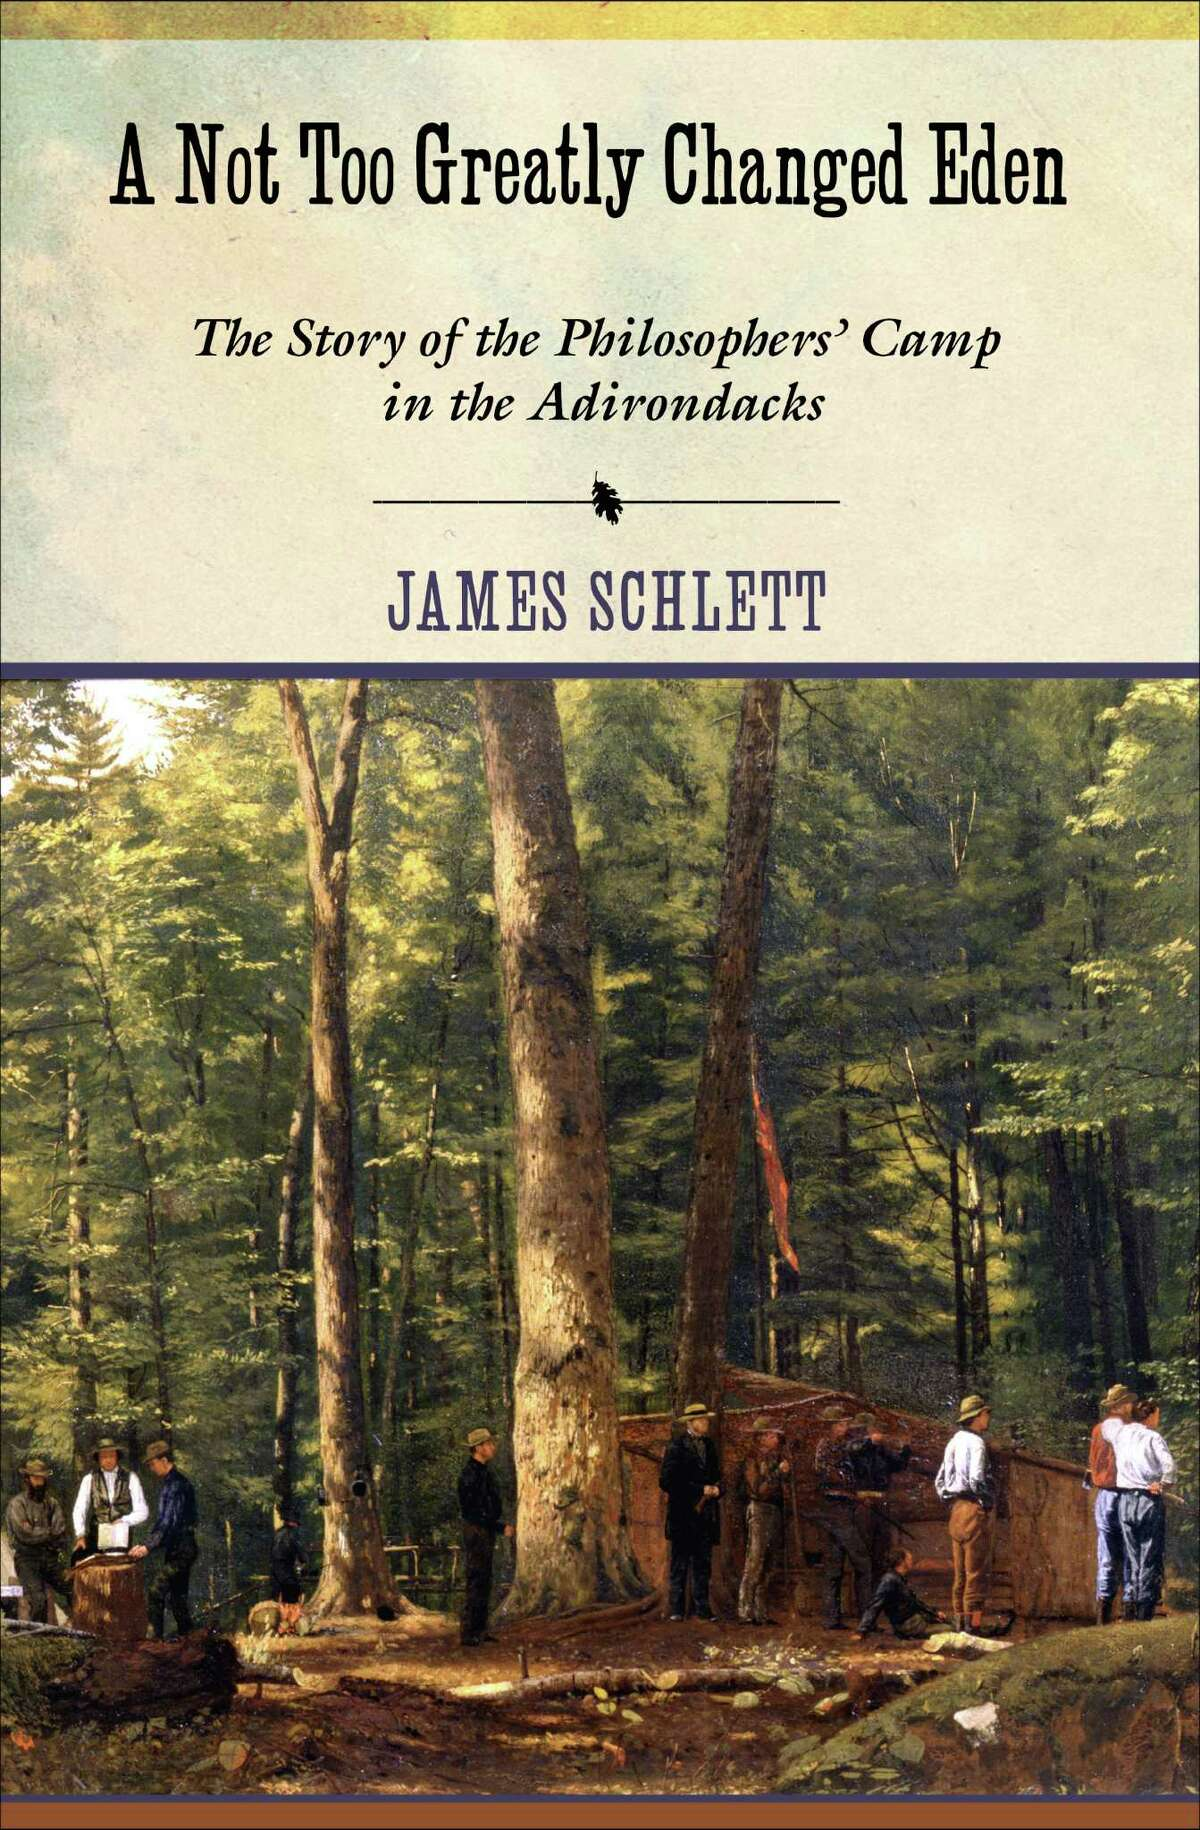 James Schlett,